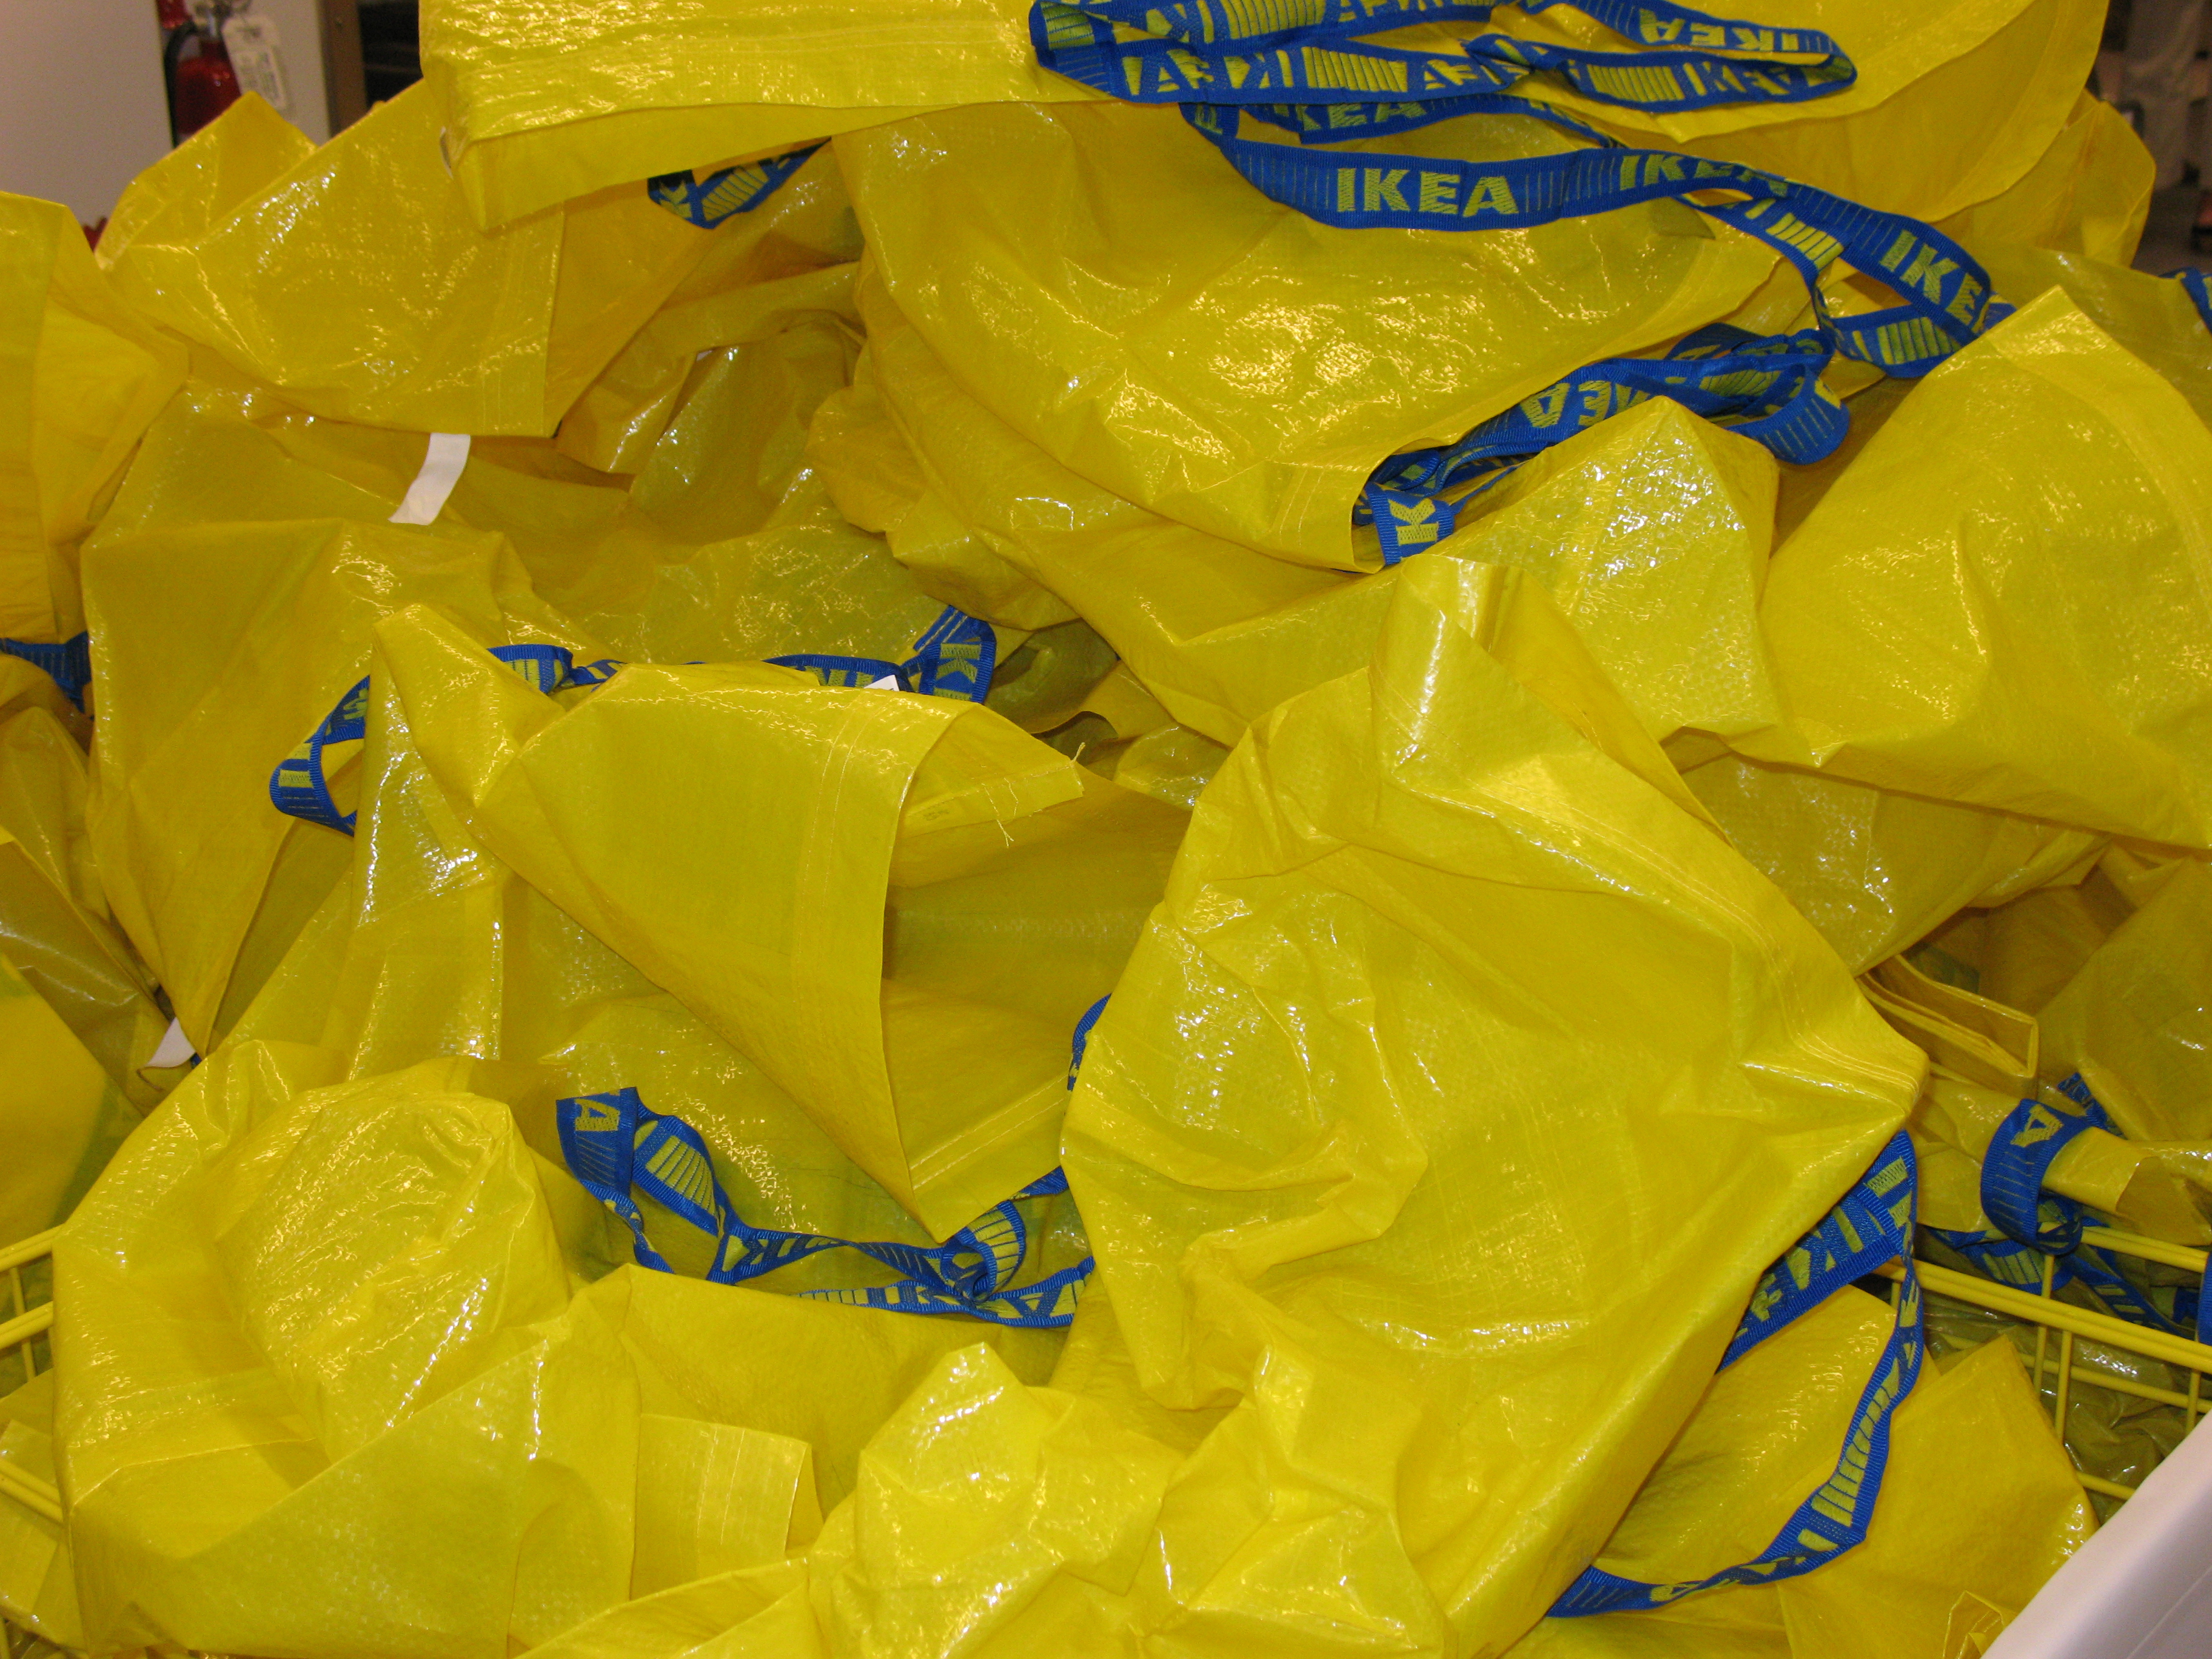 Ikea bags flickr photo sharing for Ikea jobs orlando fl